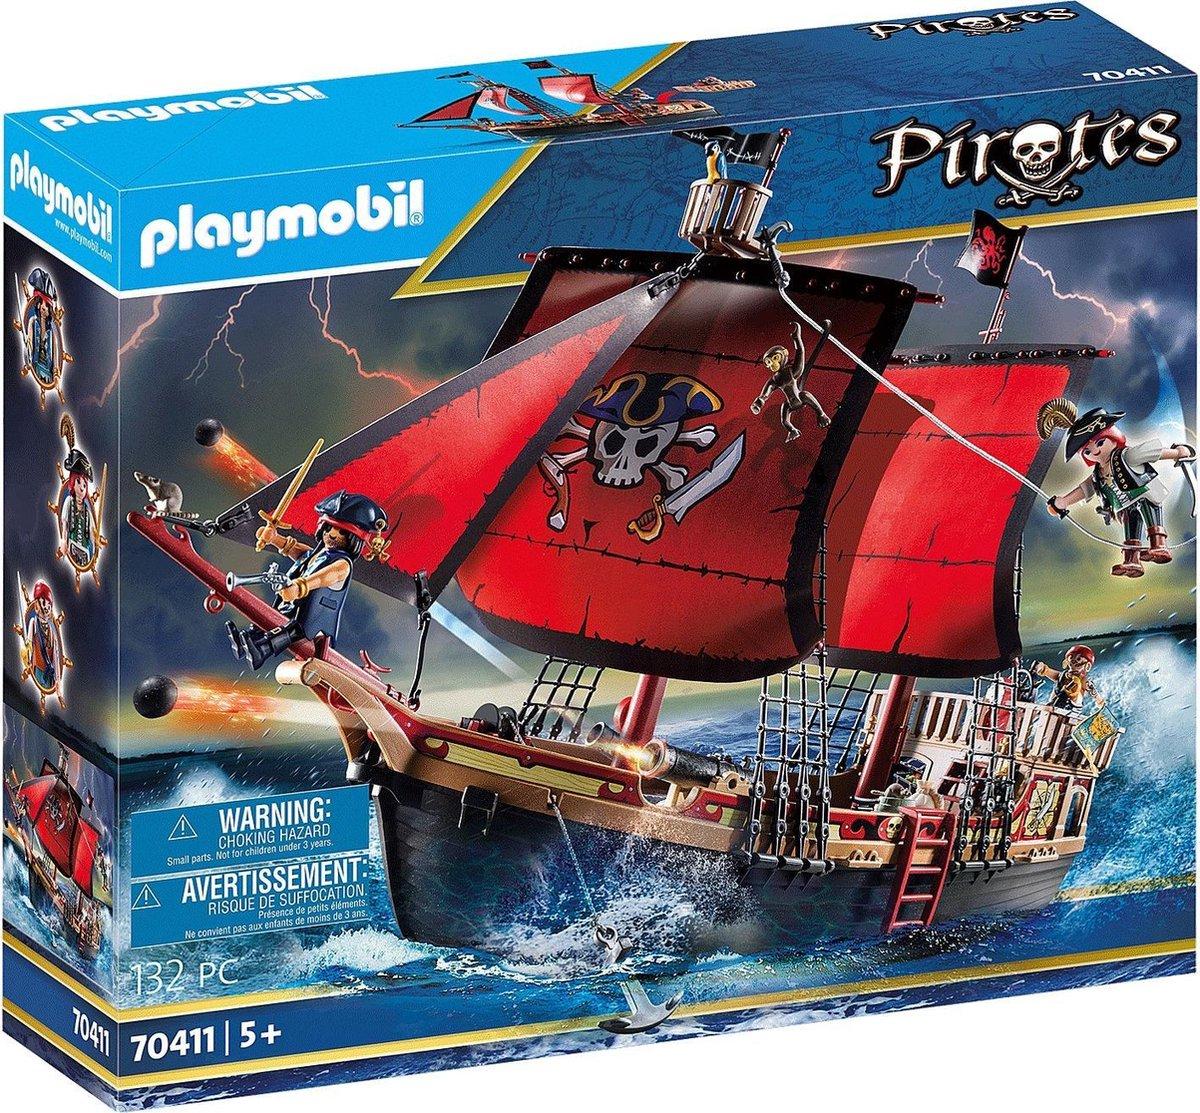 PLAYMOBIL Piratenschip - 70411